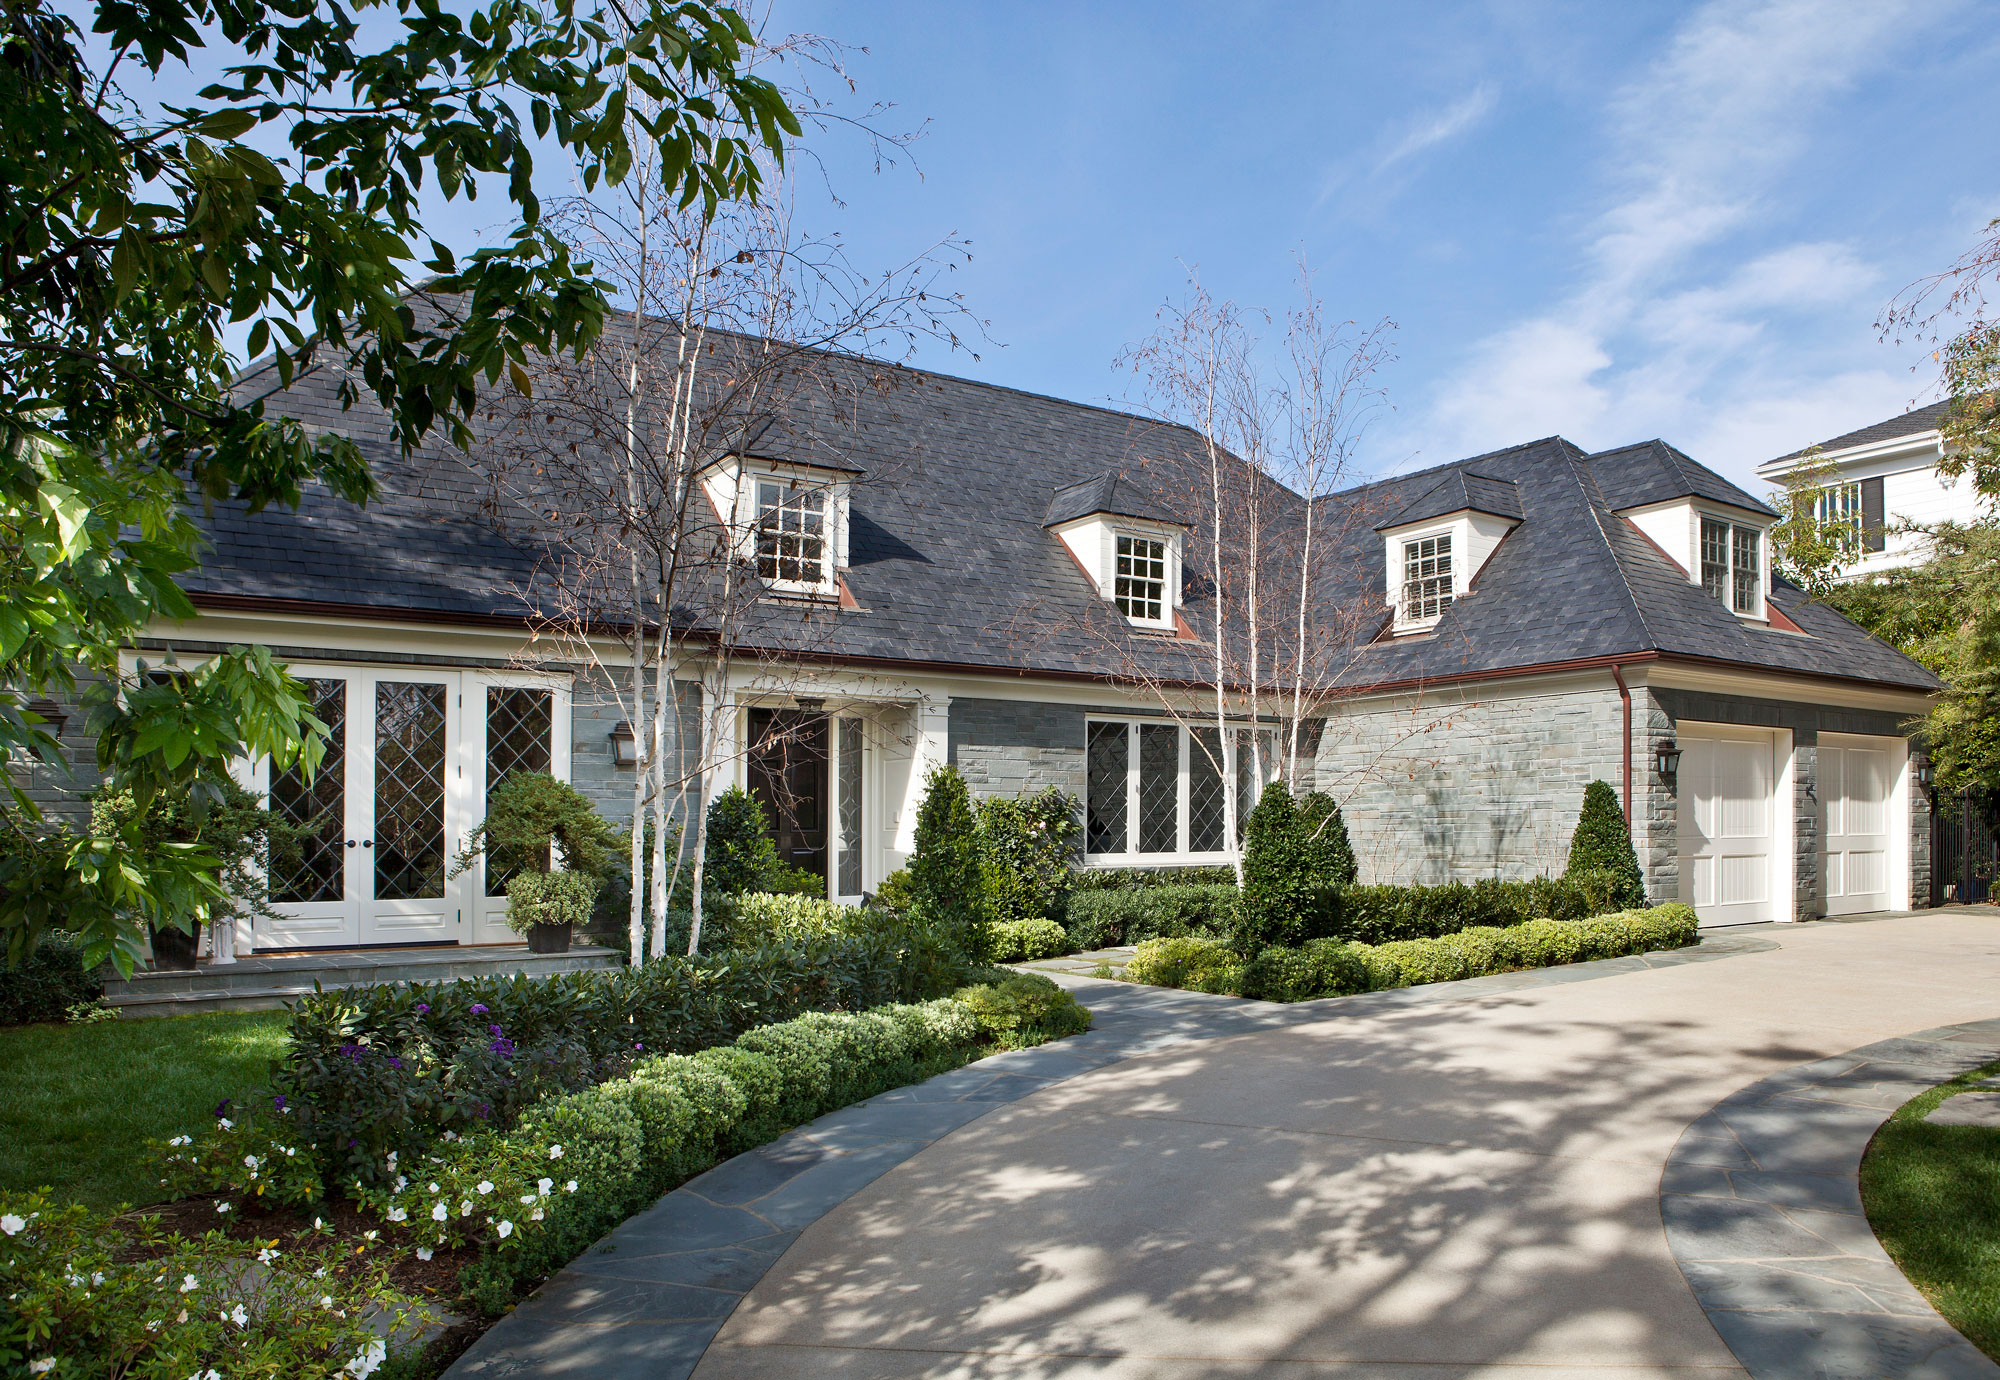 traditional-bluestone-home-driveway-front-facade-ward-jewell.jpg